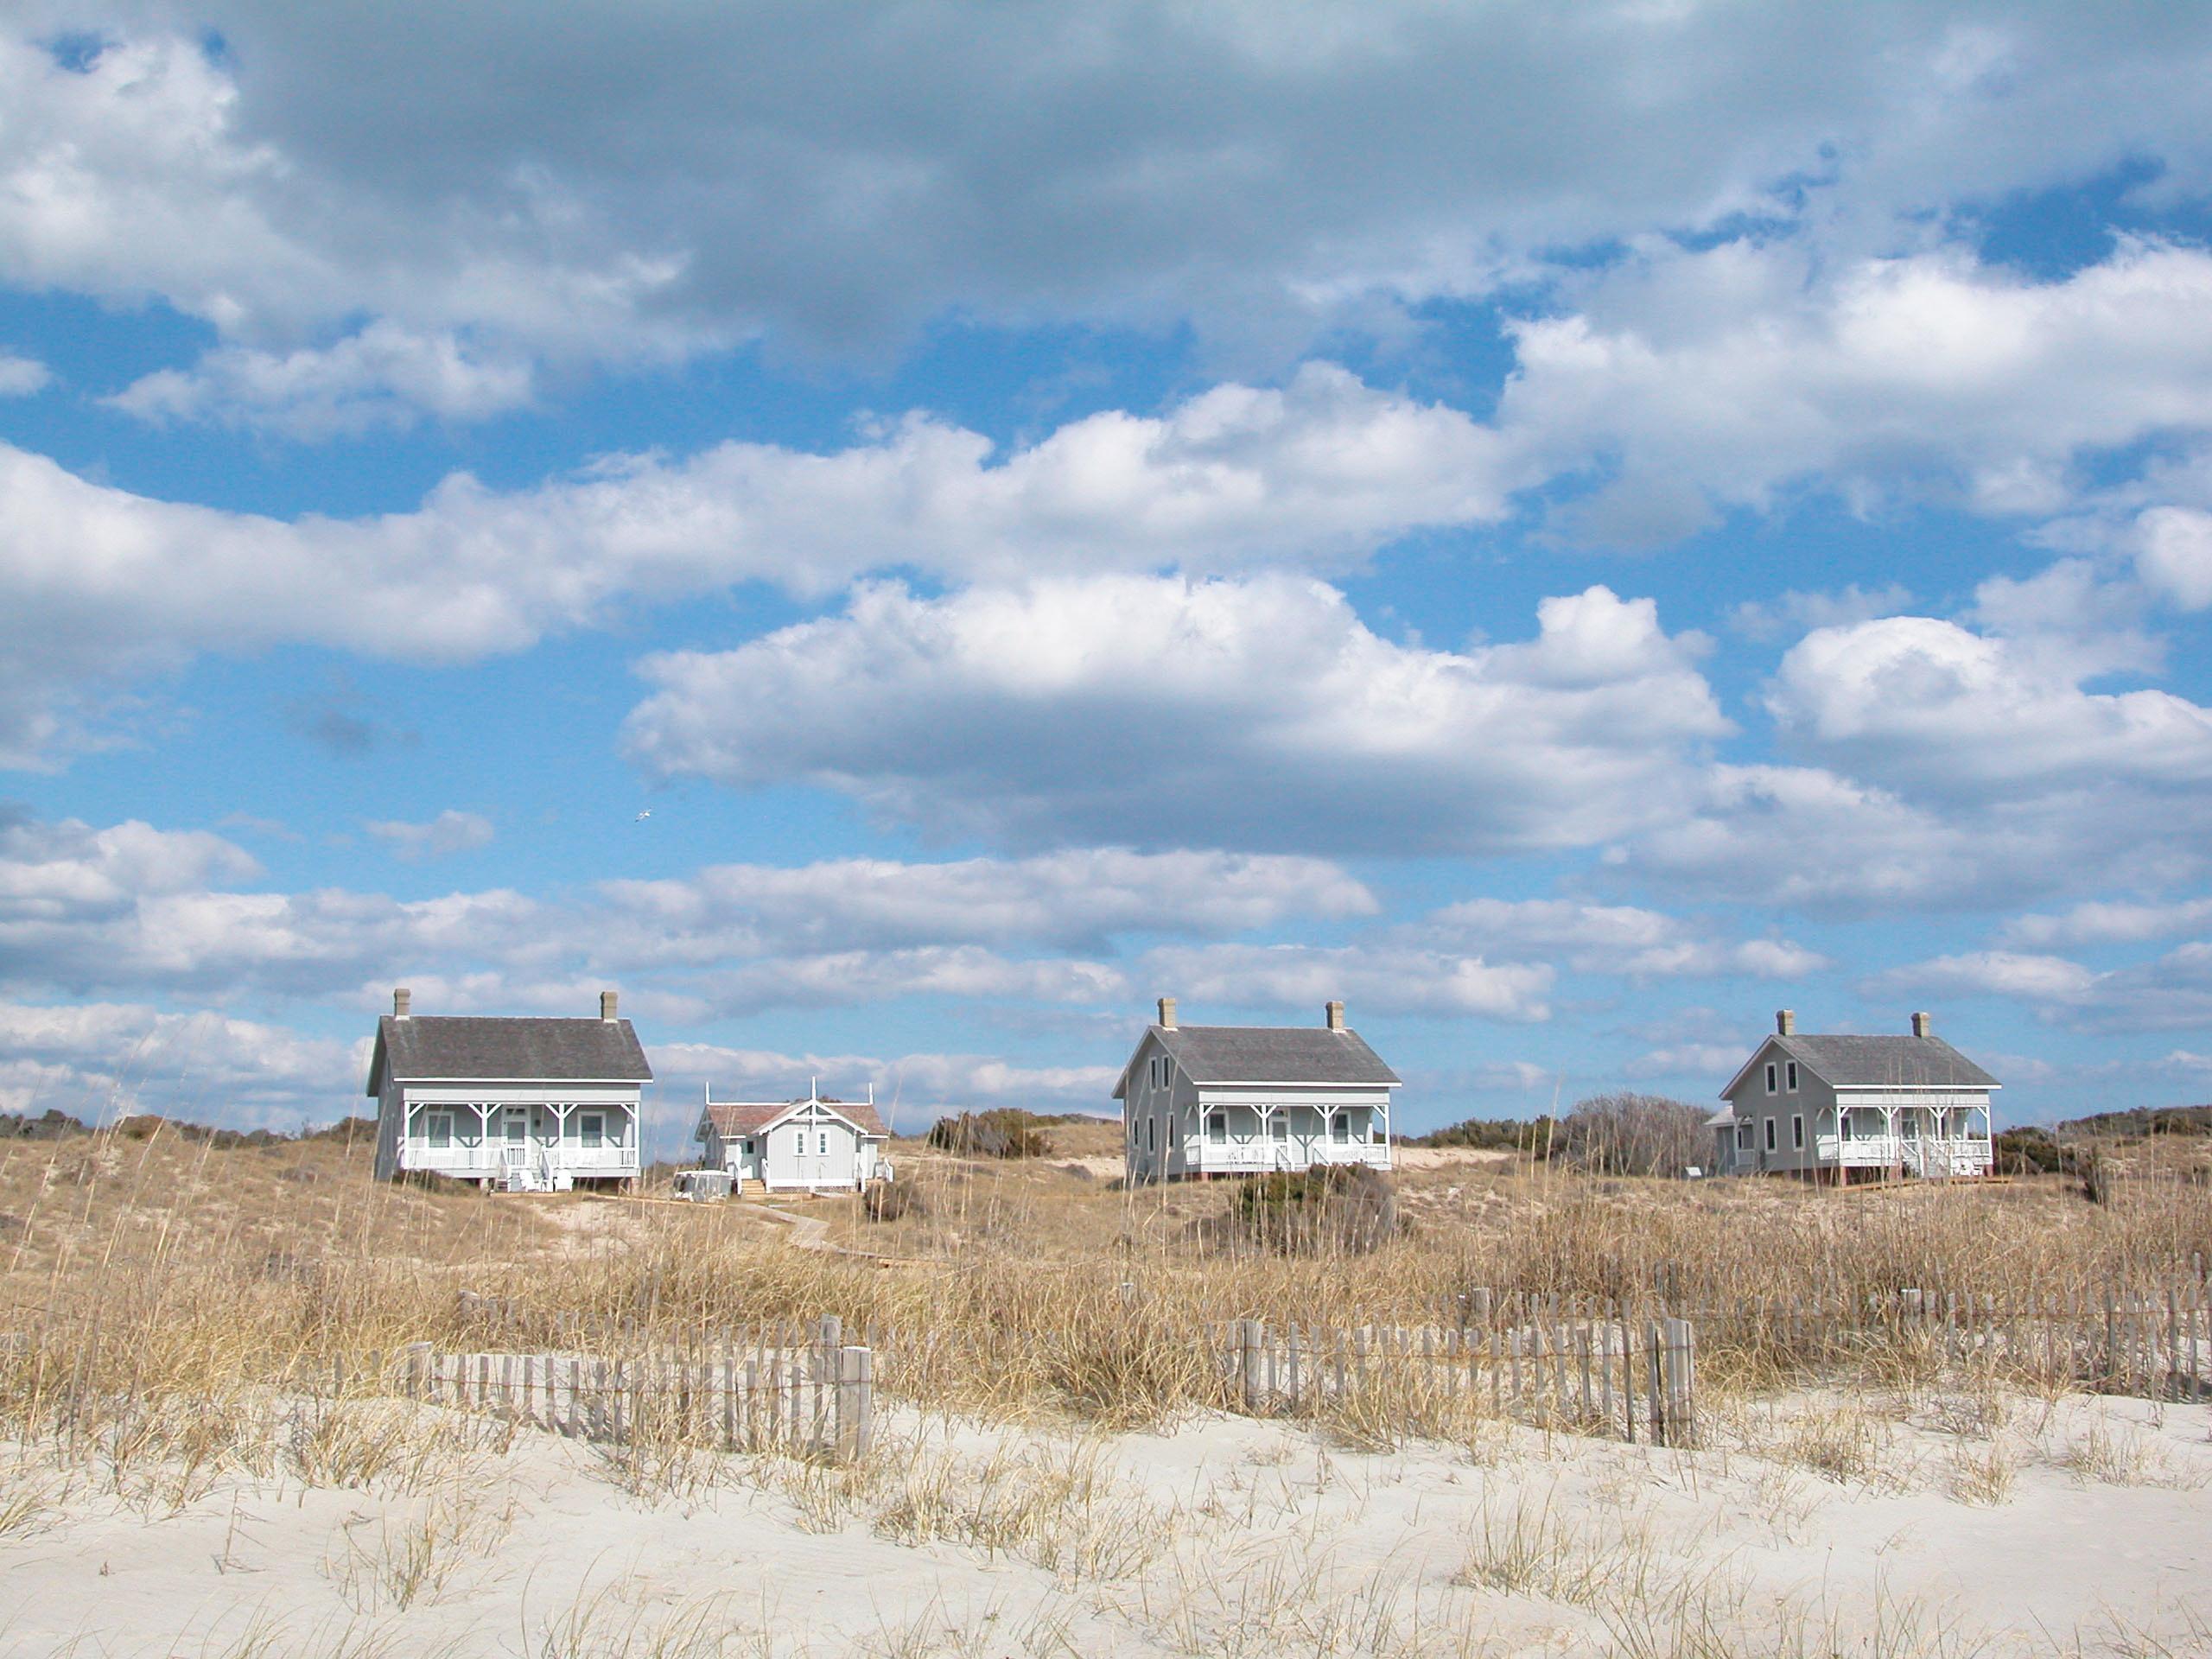 Captain Charlie's Cottages, Bald Head Island, North Carolina